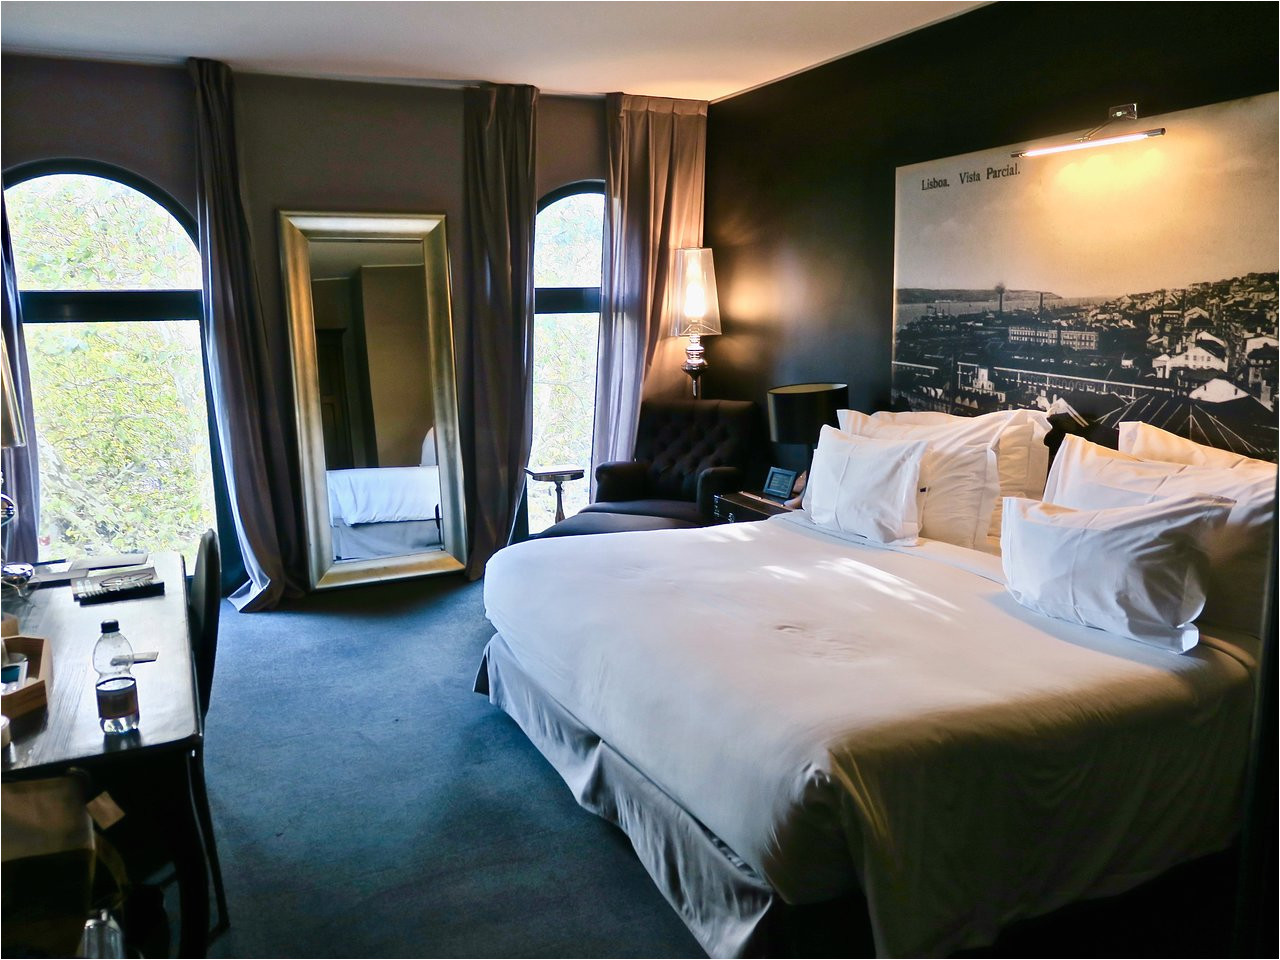 fontecruz lisboa autograph collection updated 2018 hotel reviews price comparison and 759 photos lisbon portugal tripadvisor